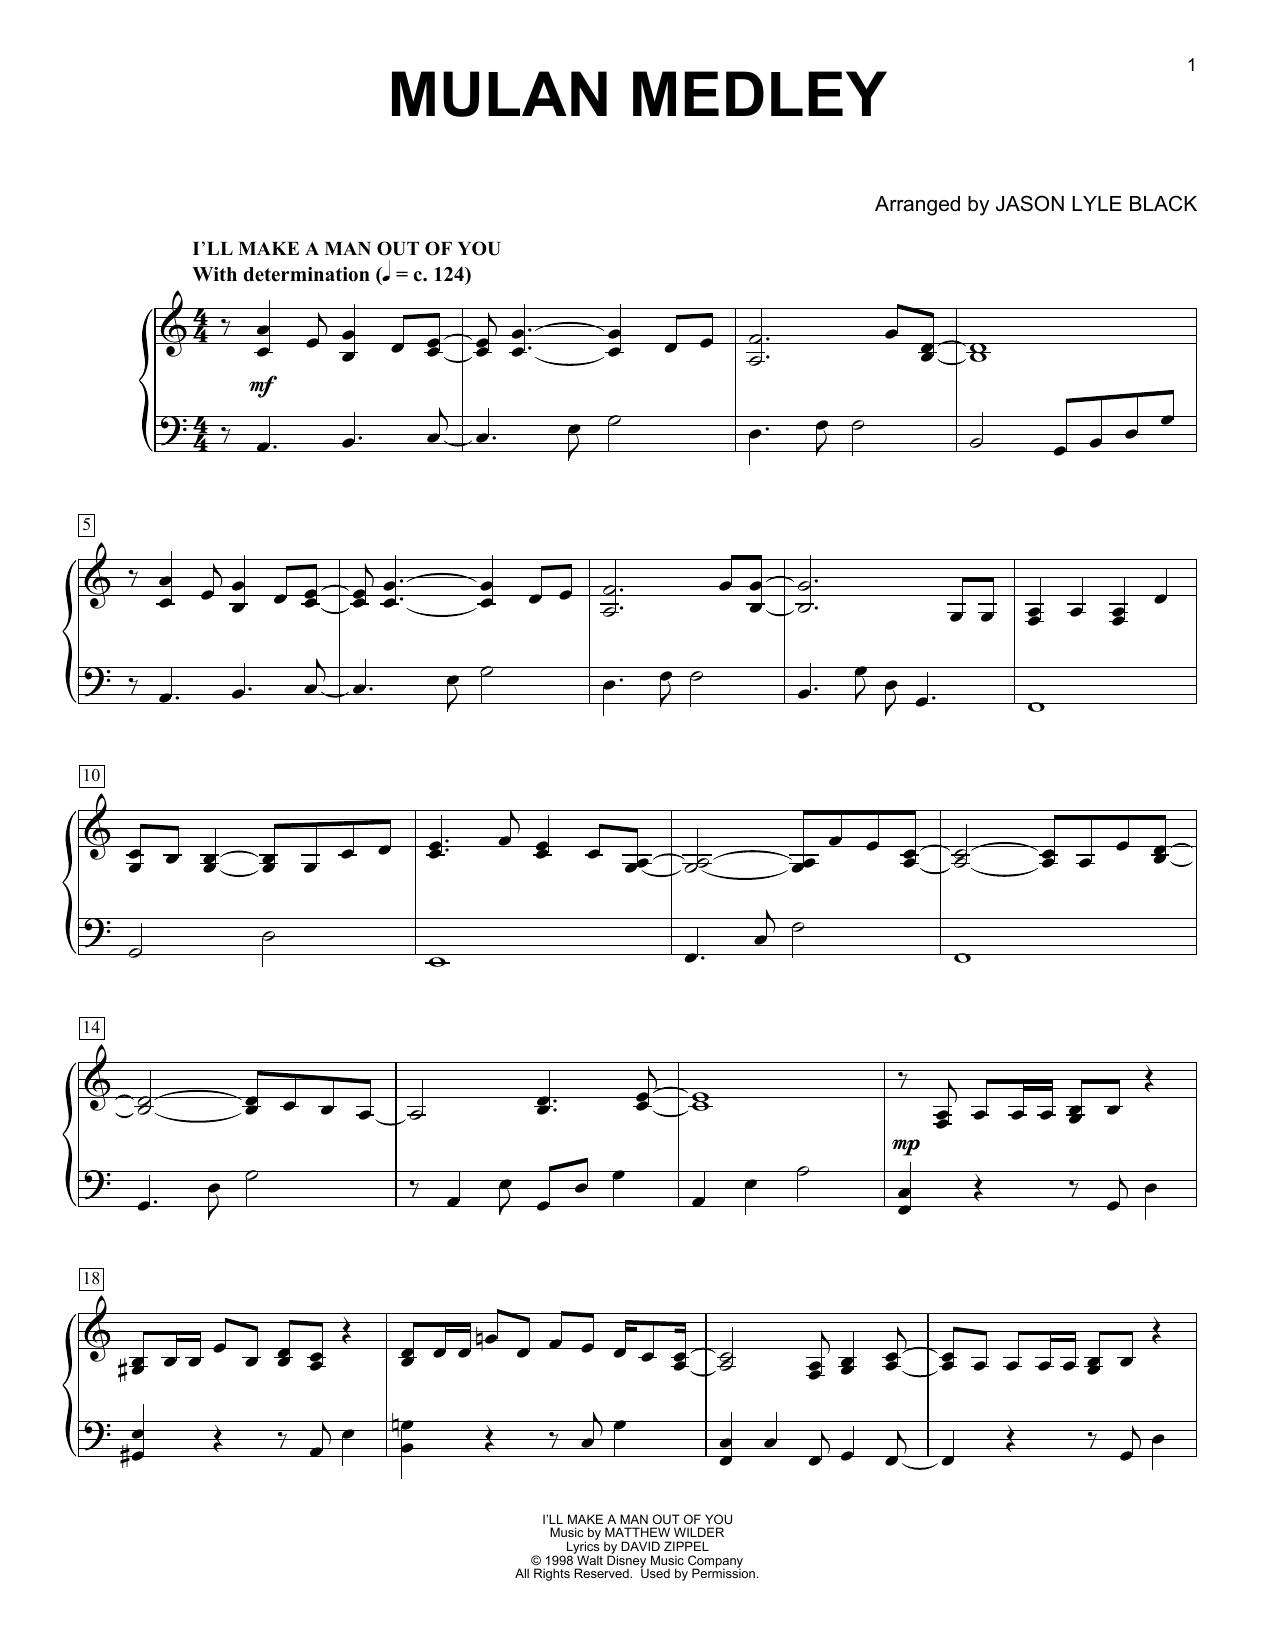 Jason Lyle Black Mulan Medley sheet music notes and chords